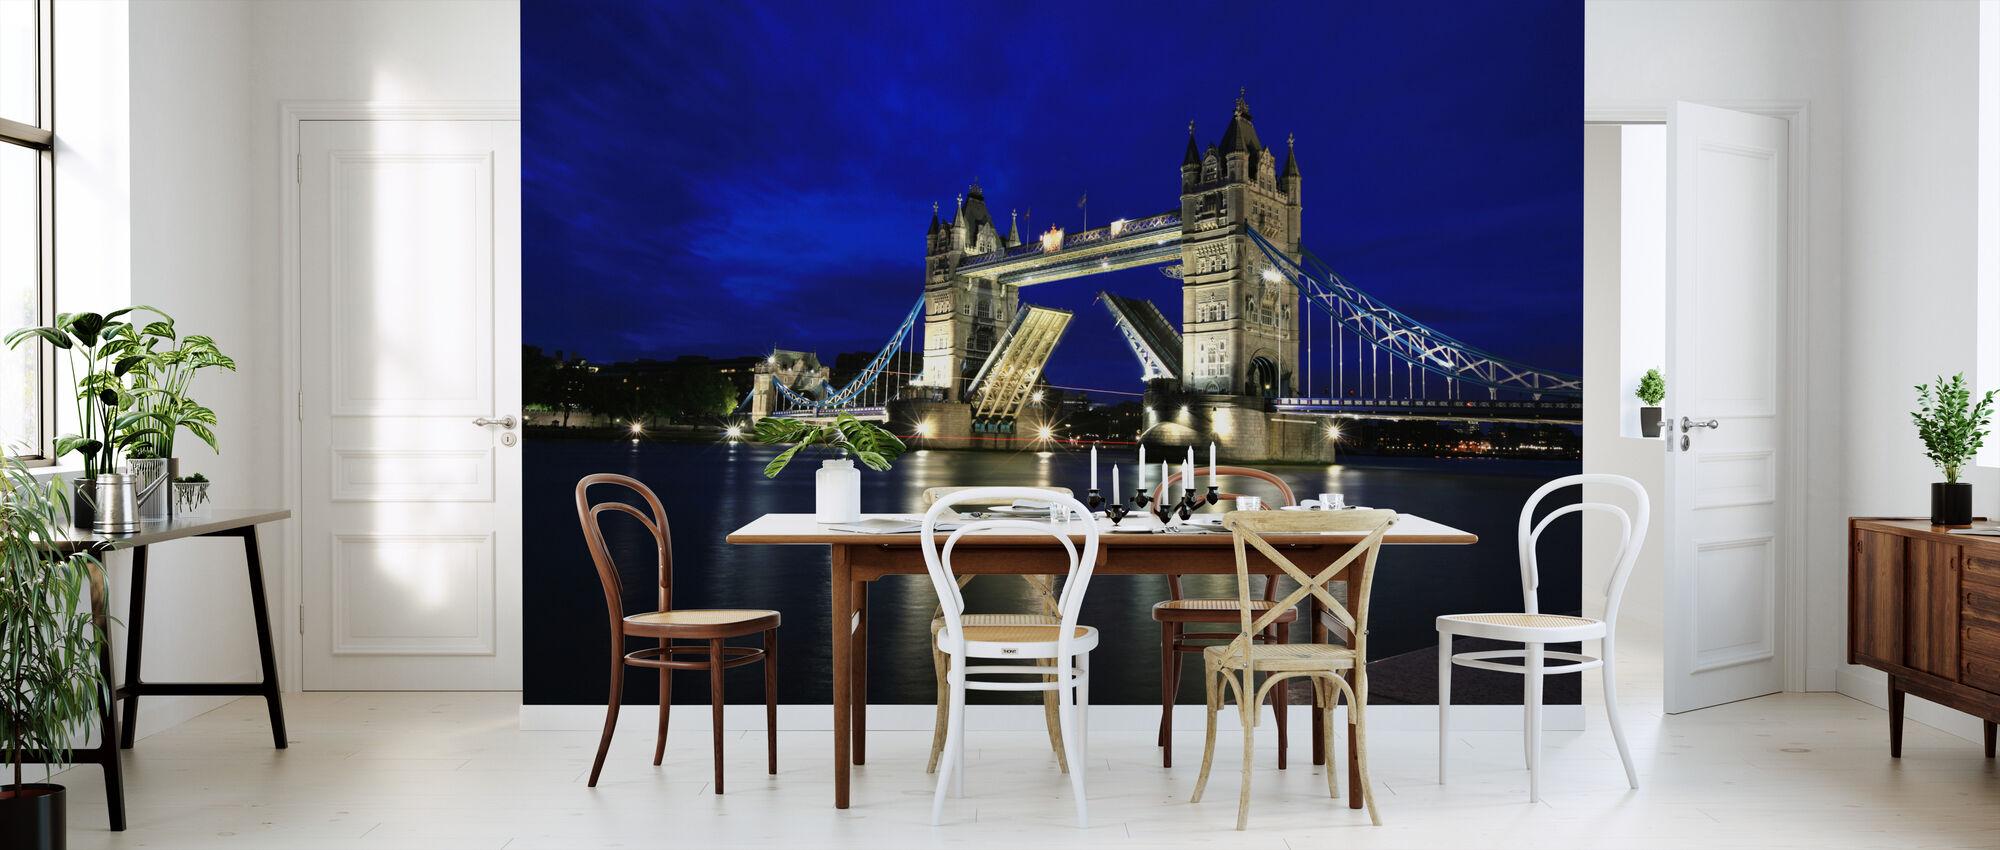 Tower Bridge at Night - Wallpaper - Kitchen